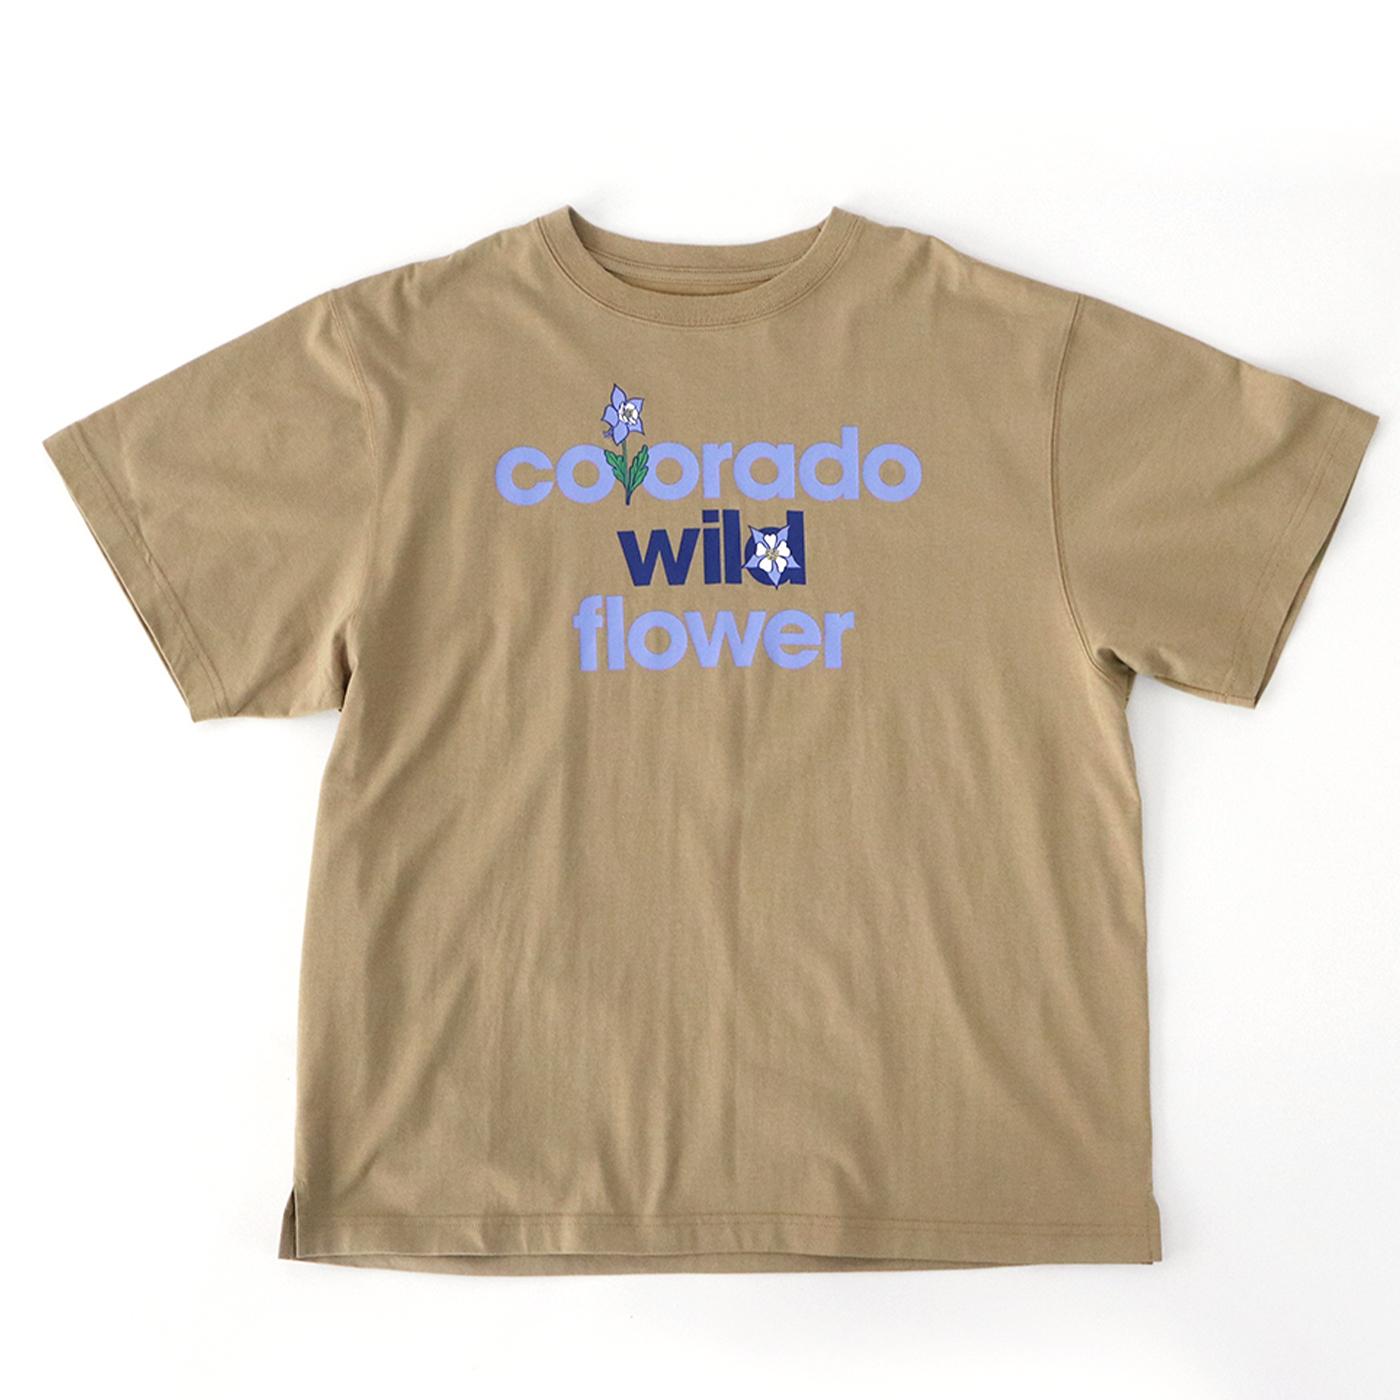 product: WILD FLOWER / color: BEIGE 1